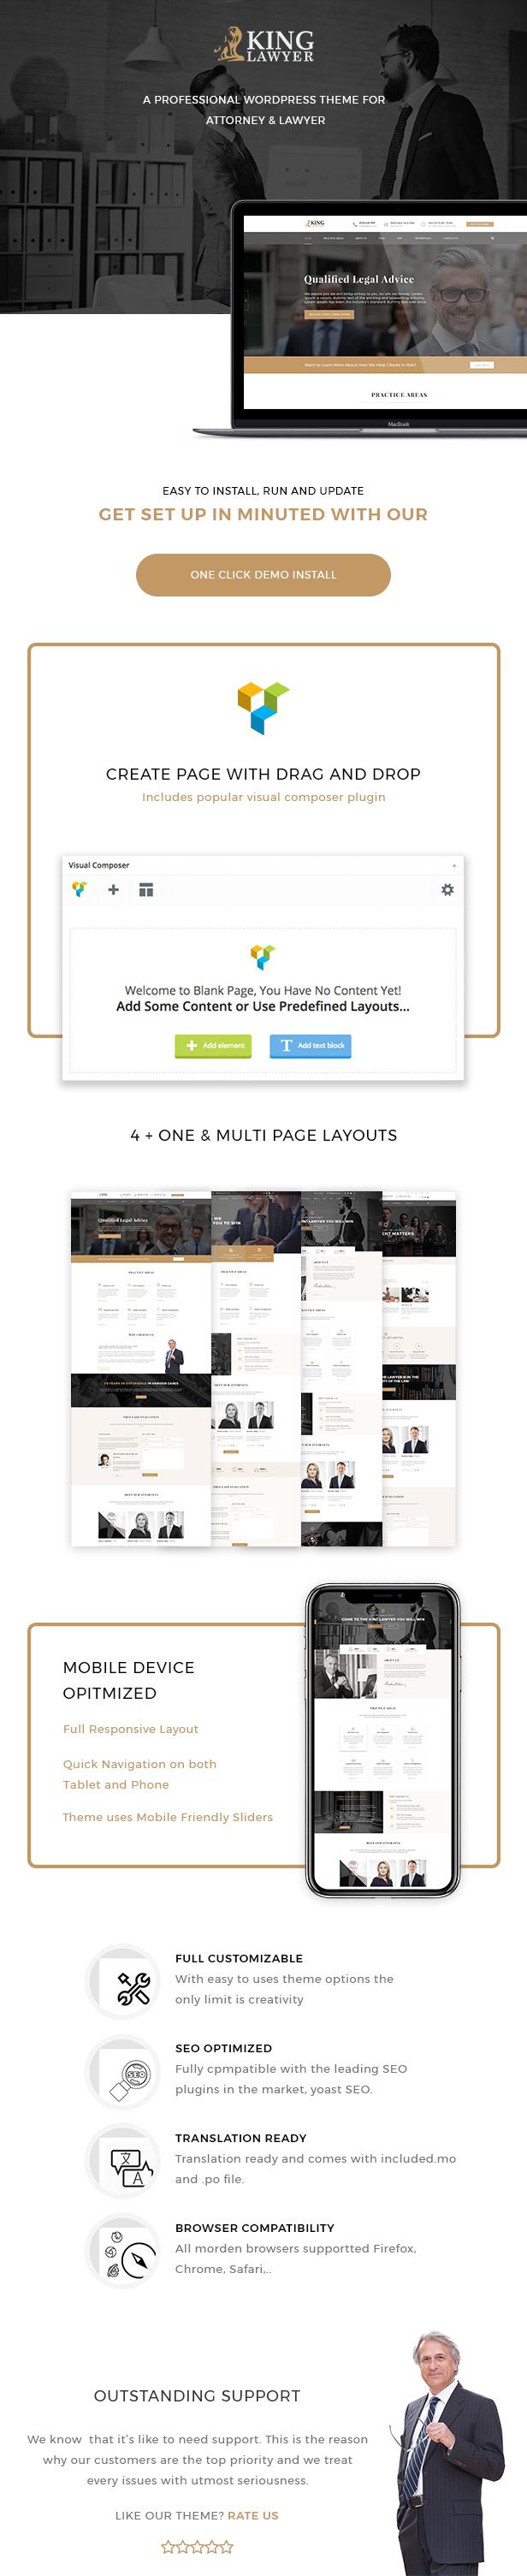 Kinglaw-Lawyers and Lawyers WordPress Theme-5